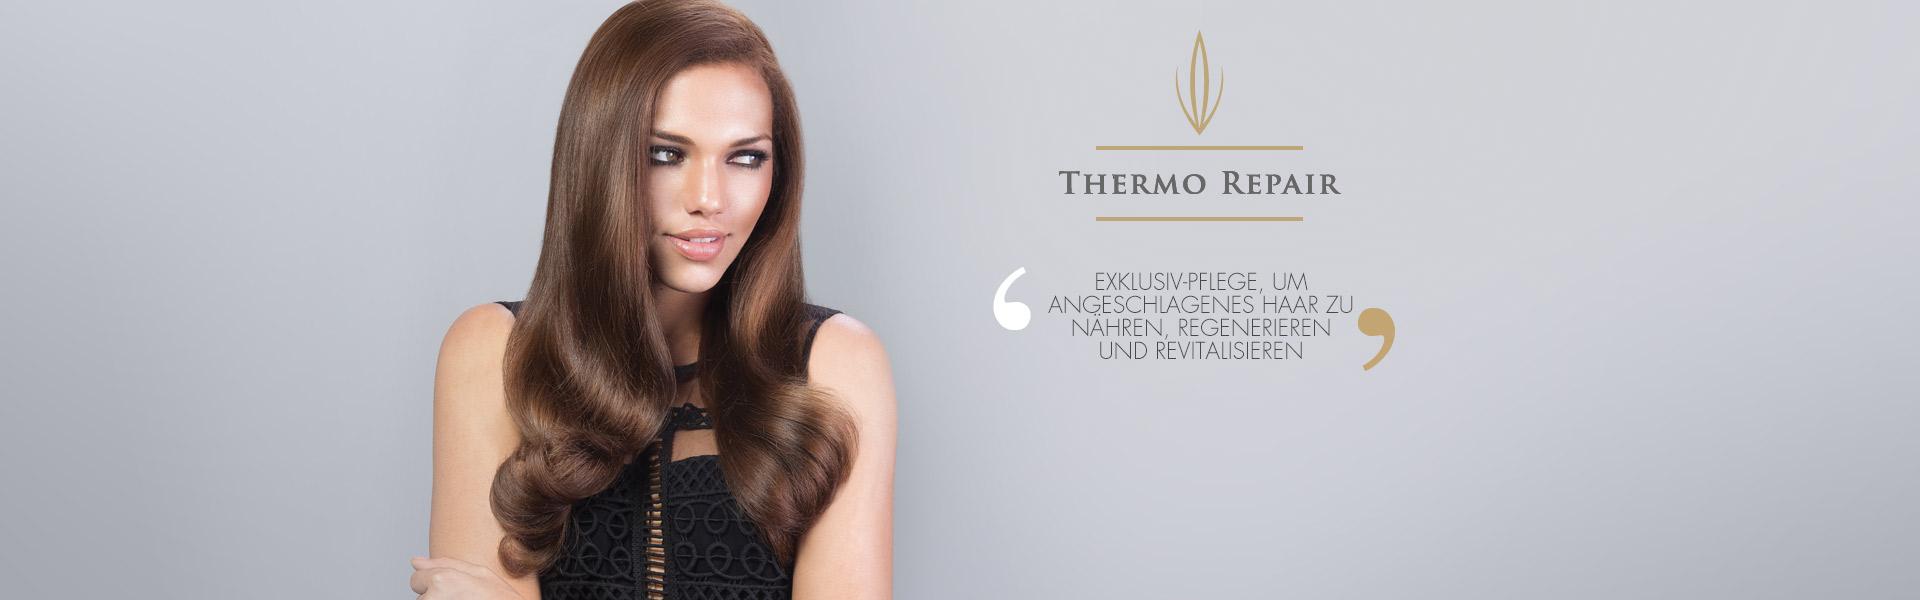 thermo_repair_de